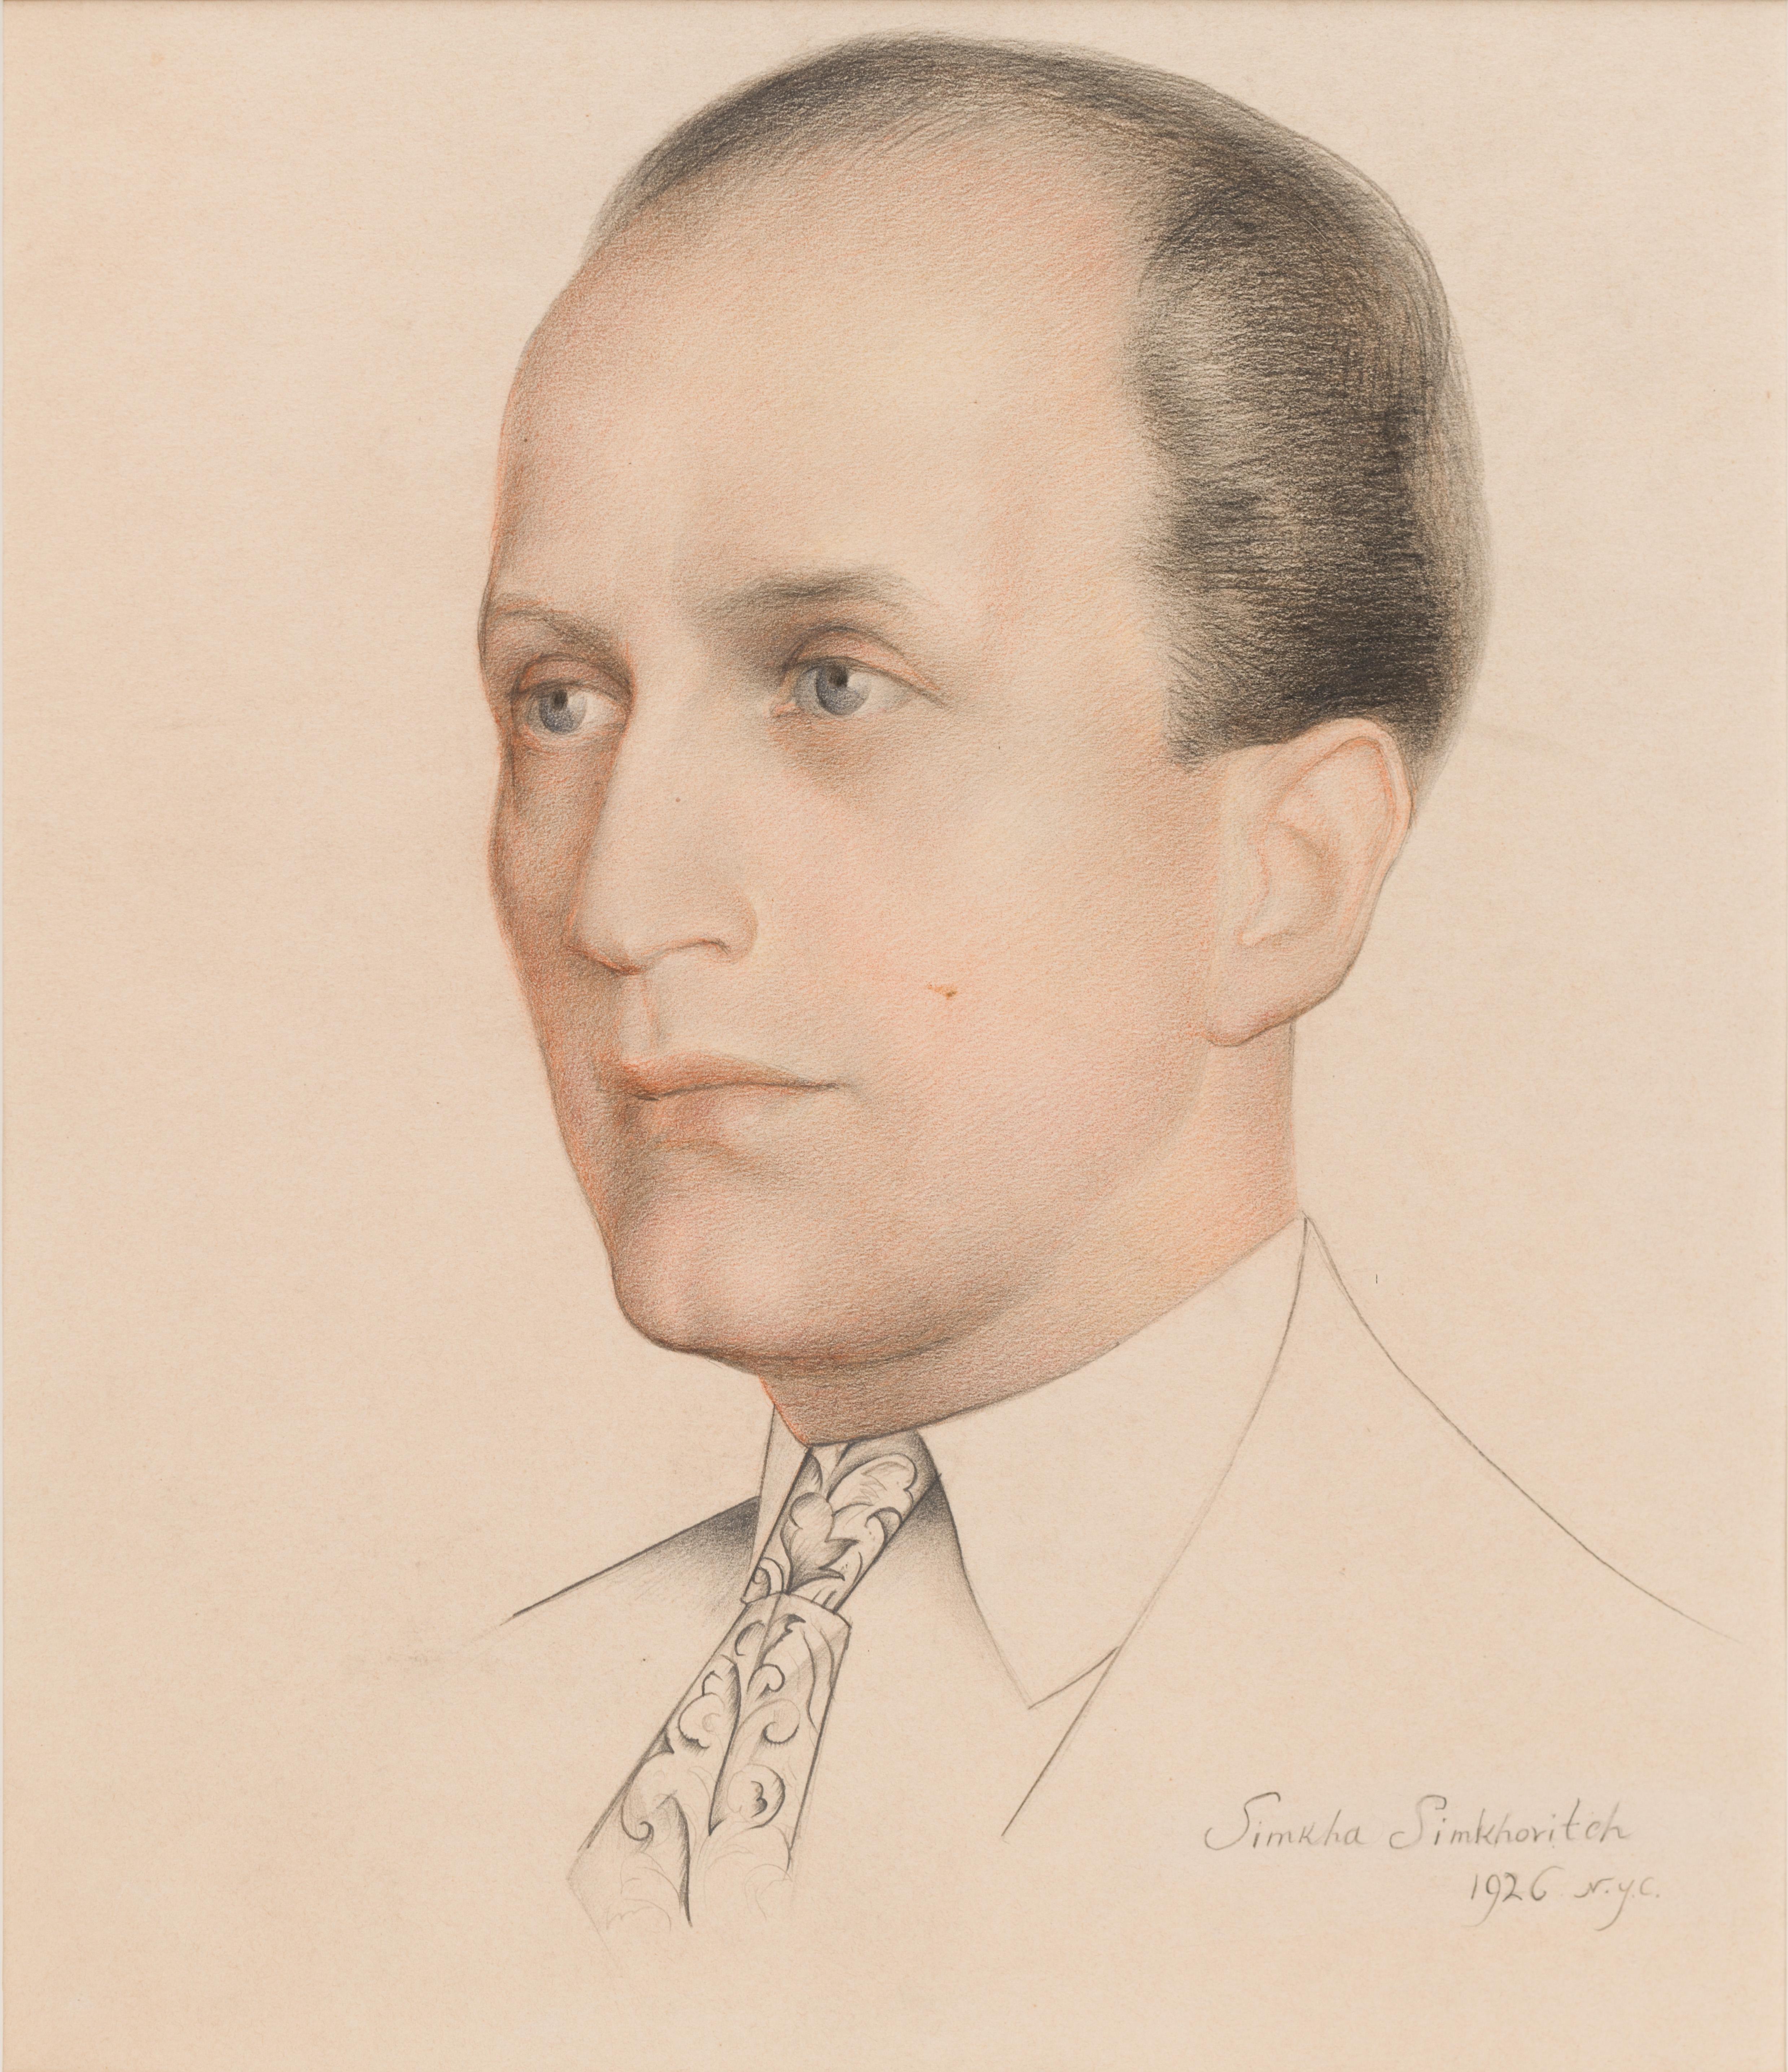 Head of a Gentleman sketch, mid modern